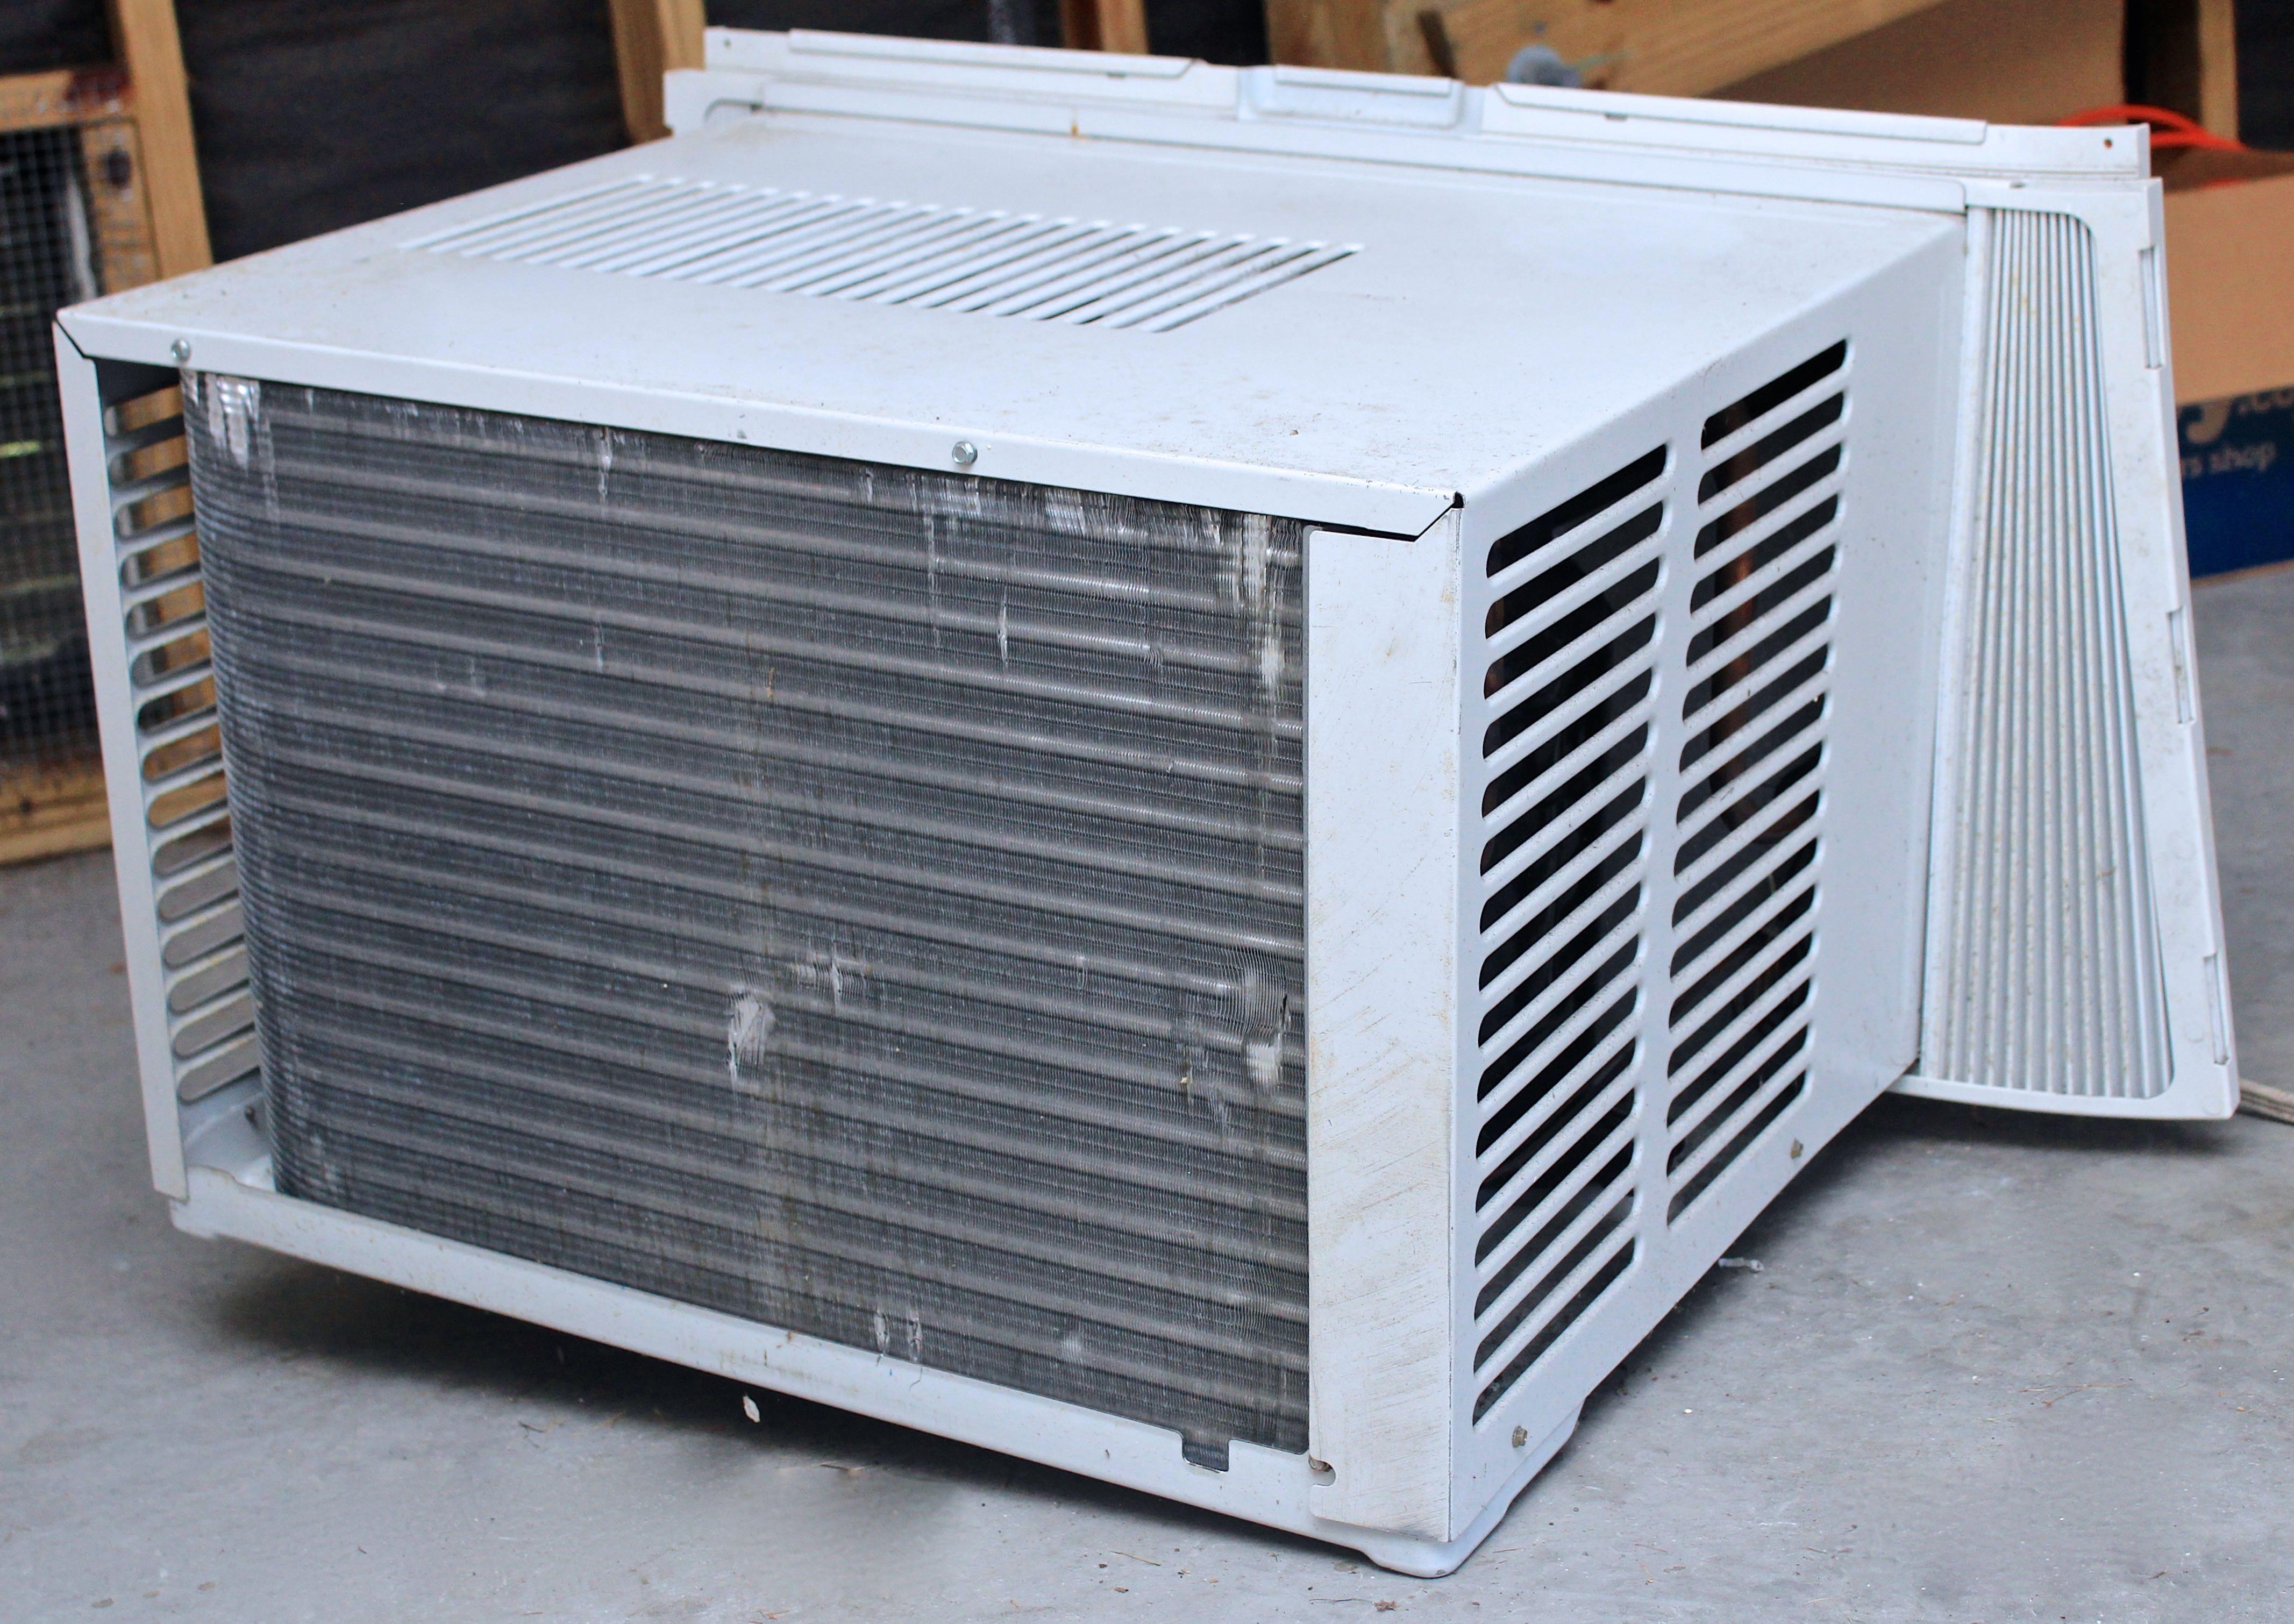 Whirlpool Air Conditioner Window Unit Ebth